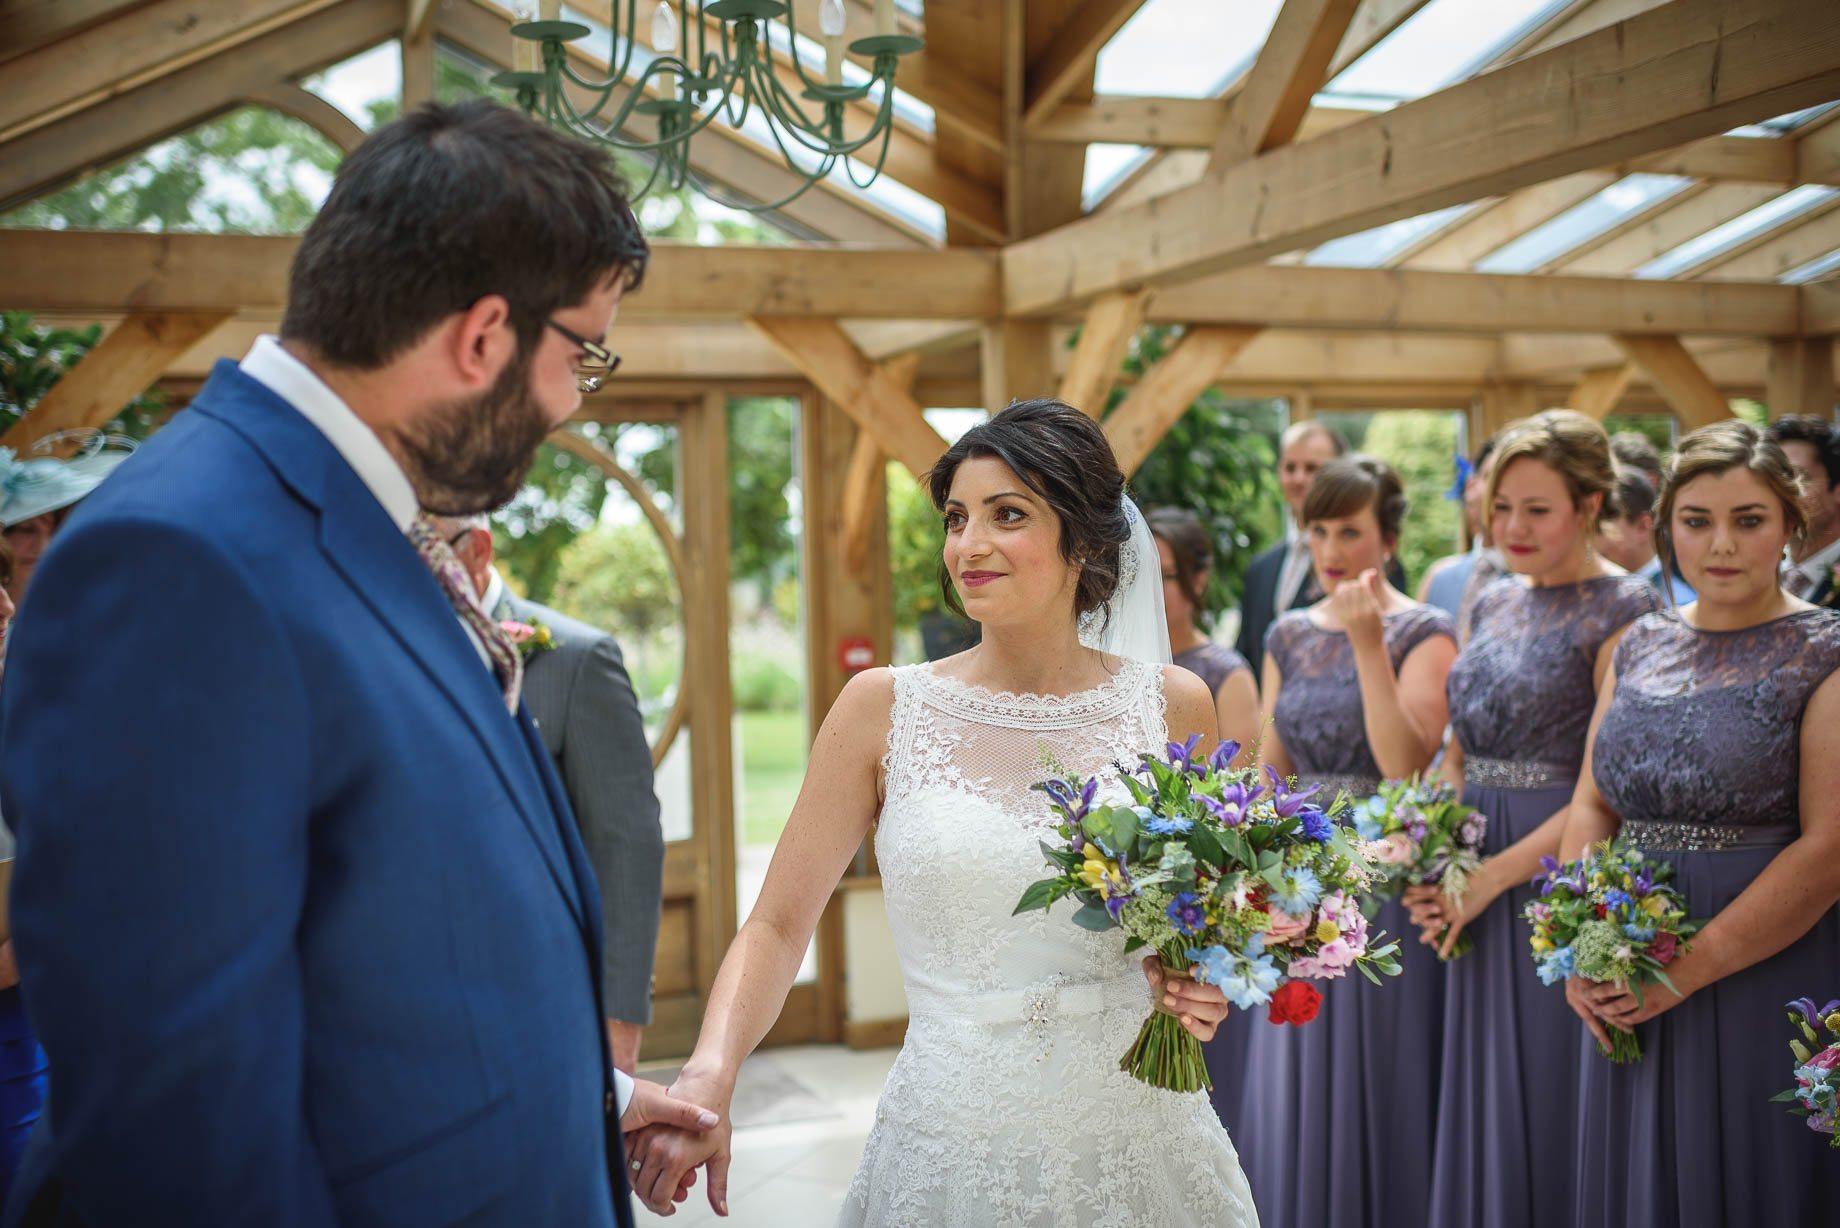 Gaynes Park wedding photography - Guy Collier Photography - Rachel and Jon (67 of 169)